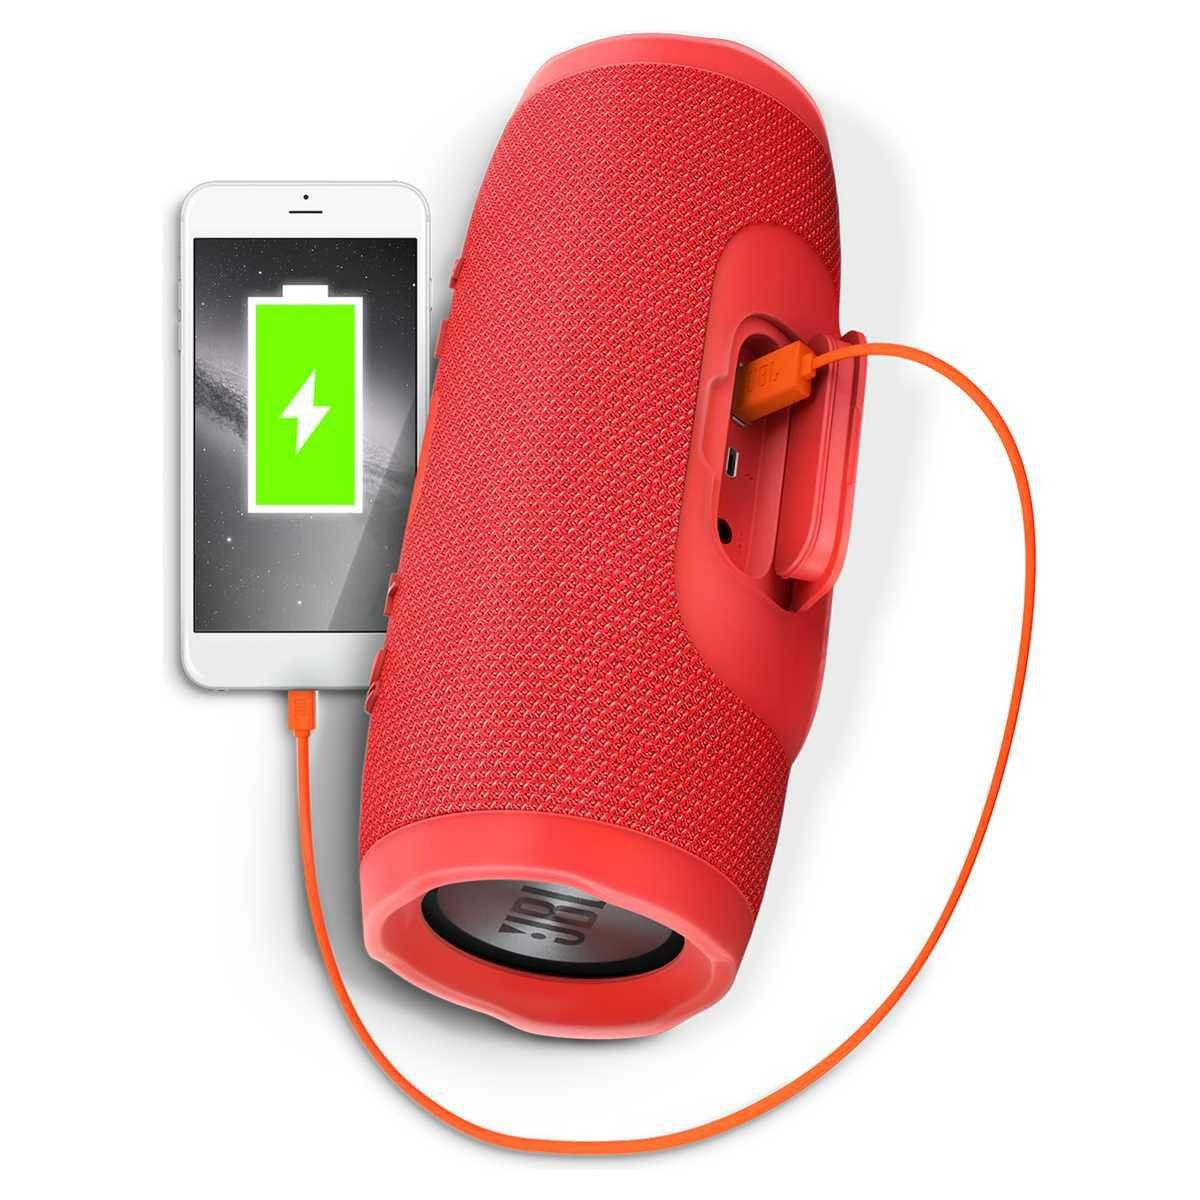 Kit 2 Caixa De Som Jbl Charge 3 Bluetooth Original Sincroniza